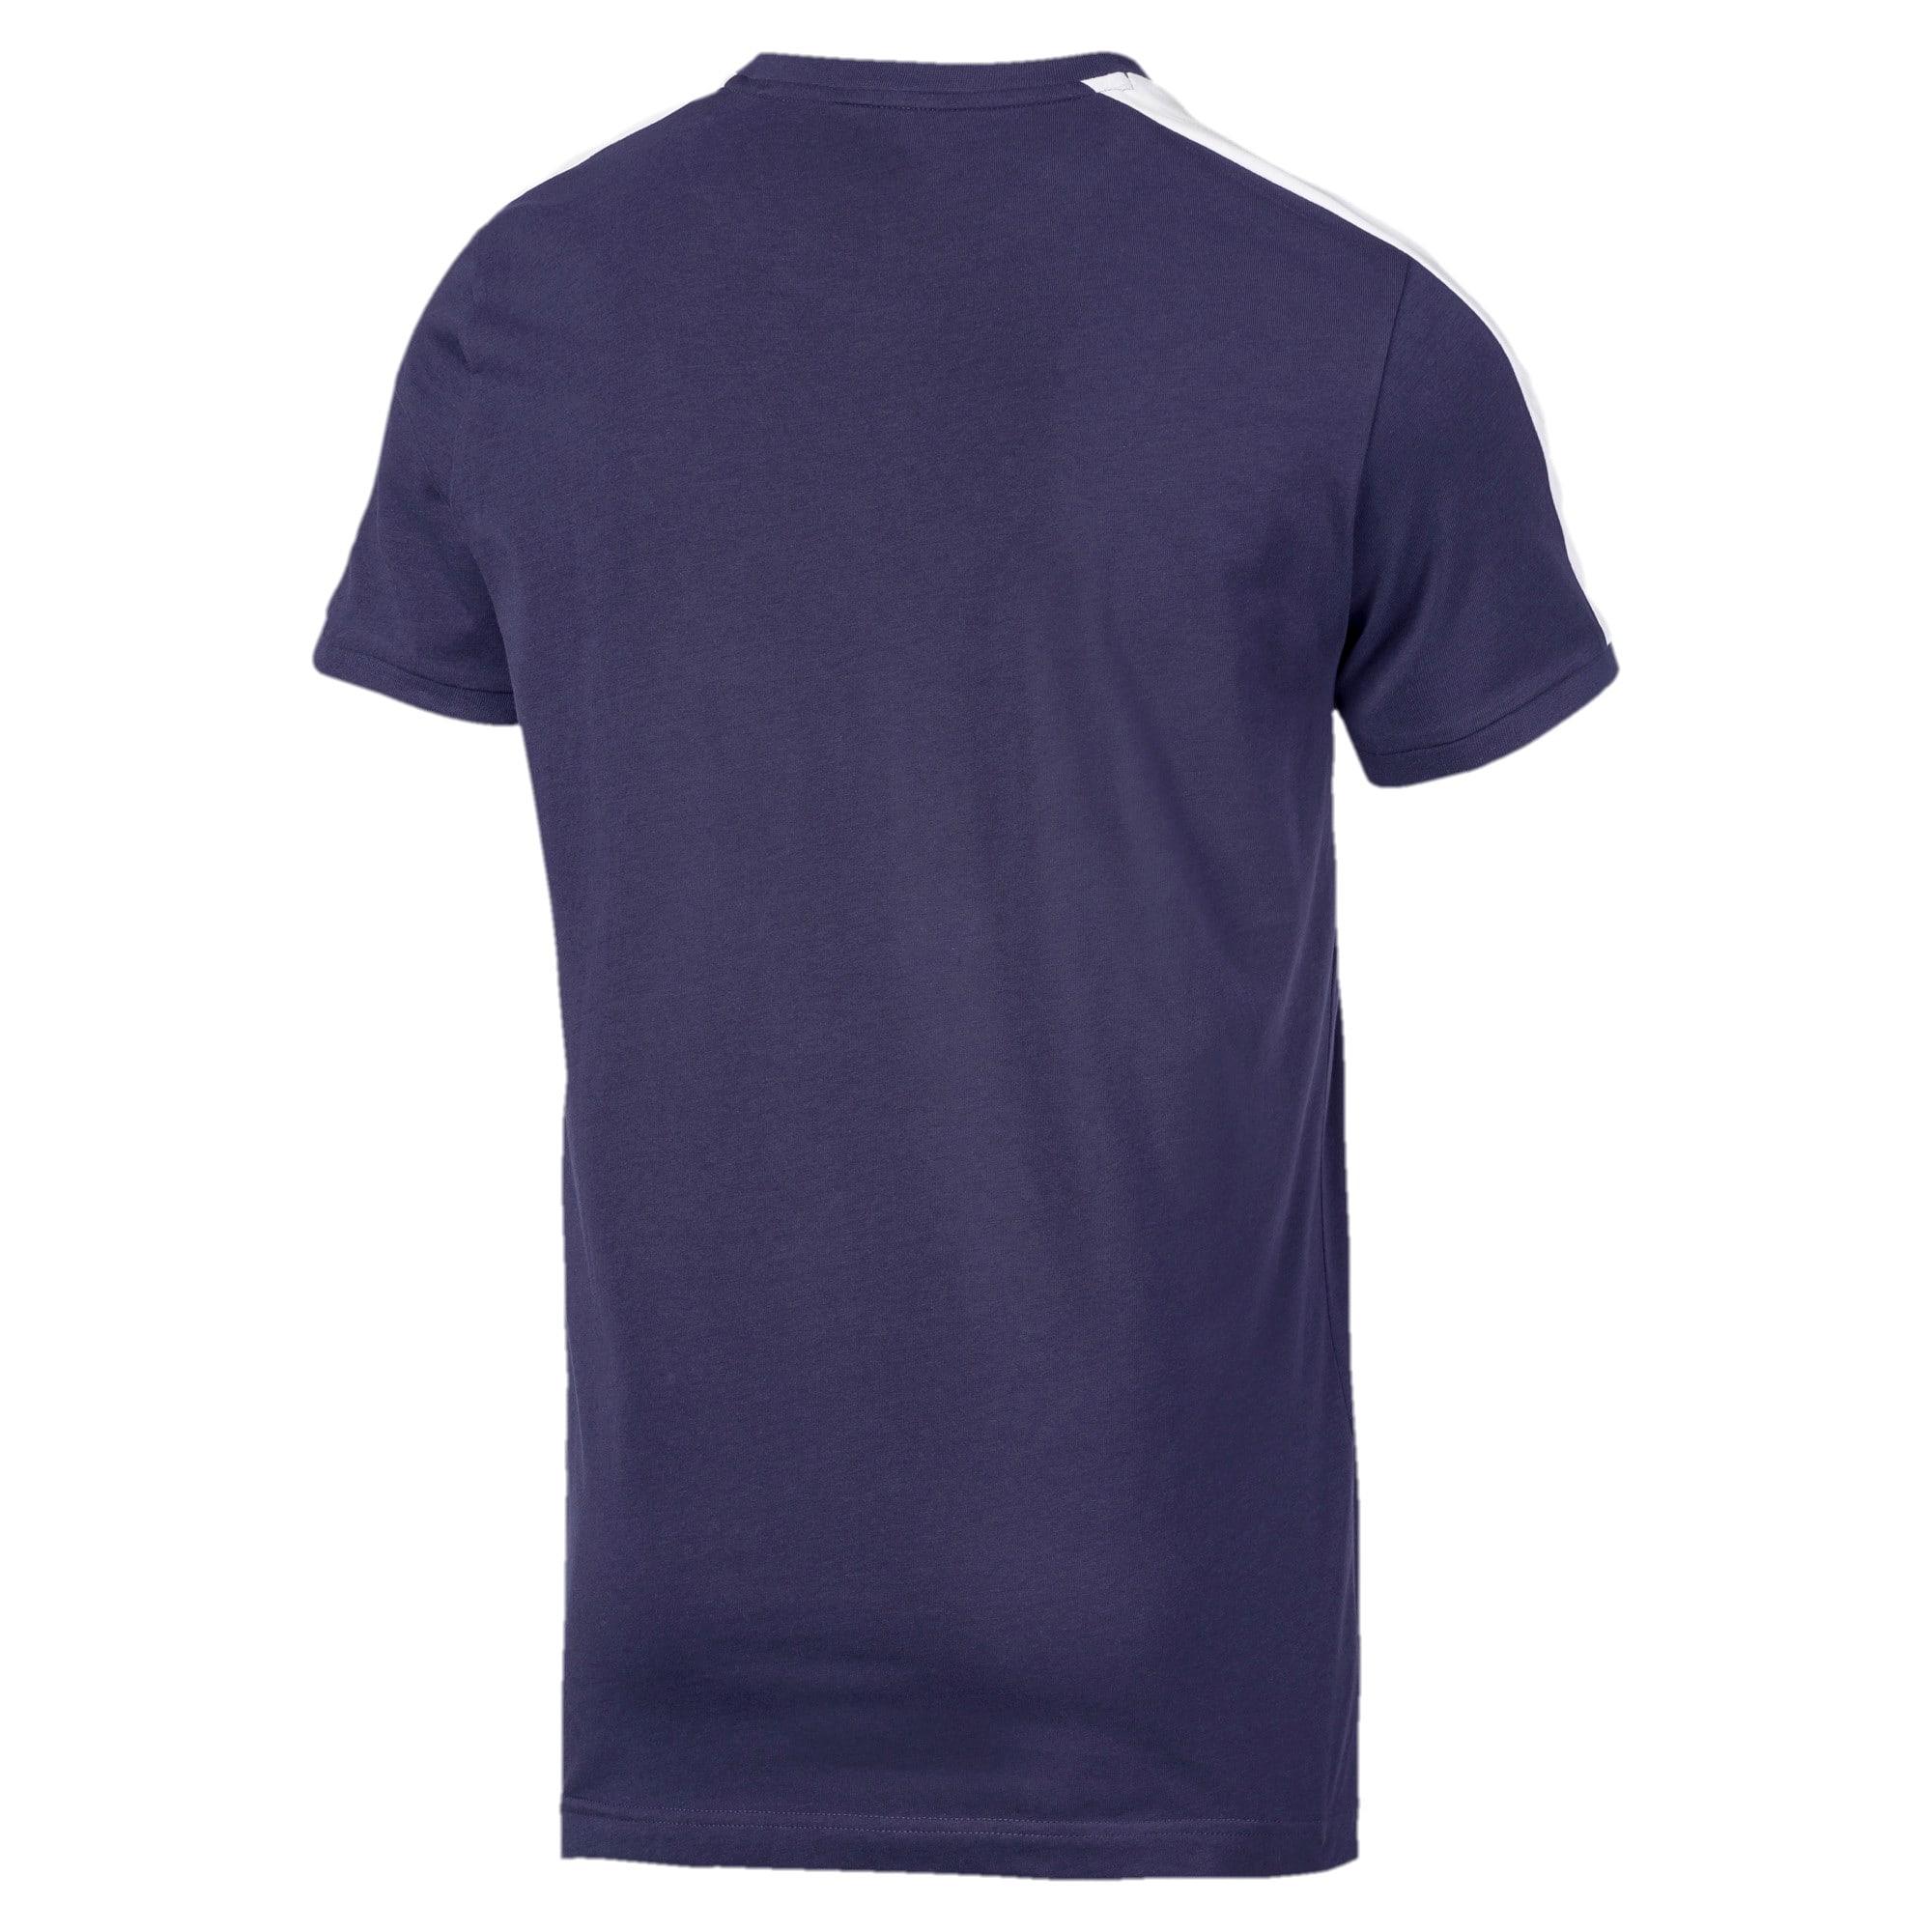 Thumbnail 5 van Iconisch T7 T-shirt voor mannen, Nachtblauw, medium